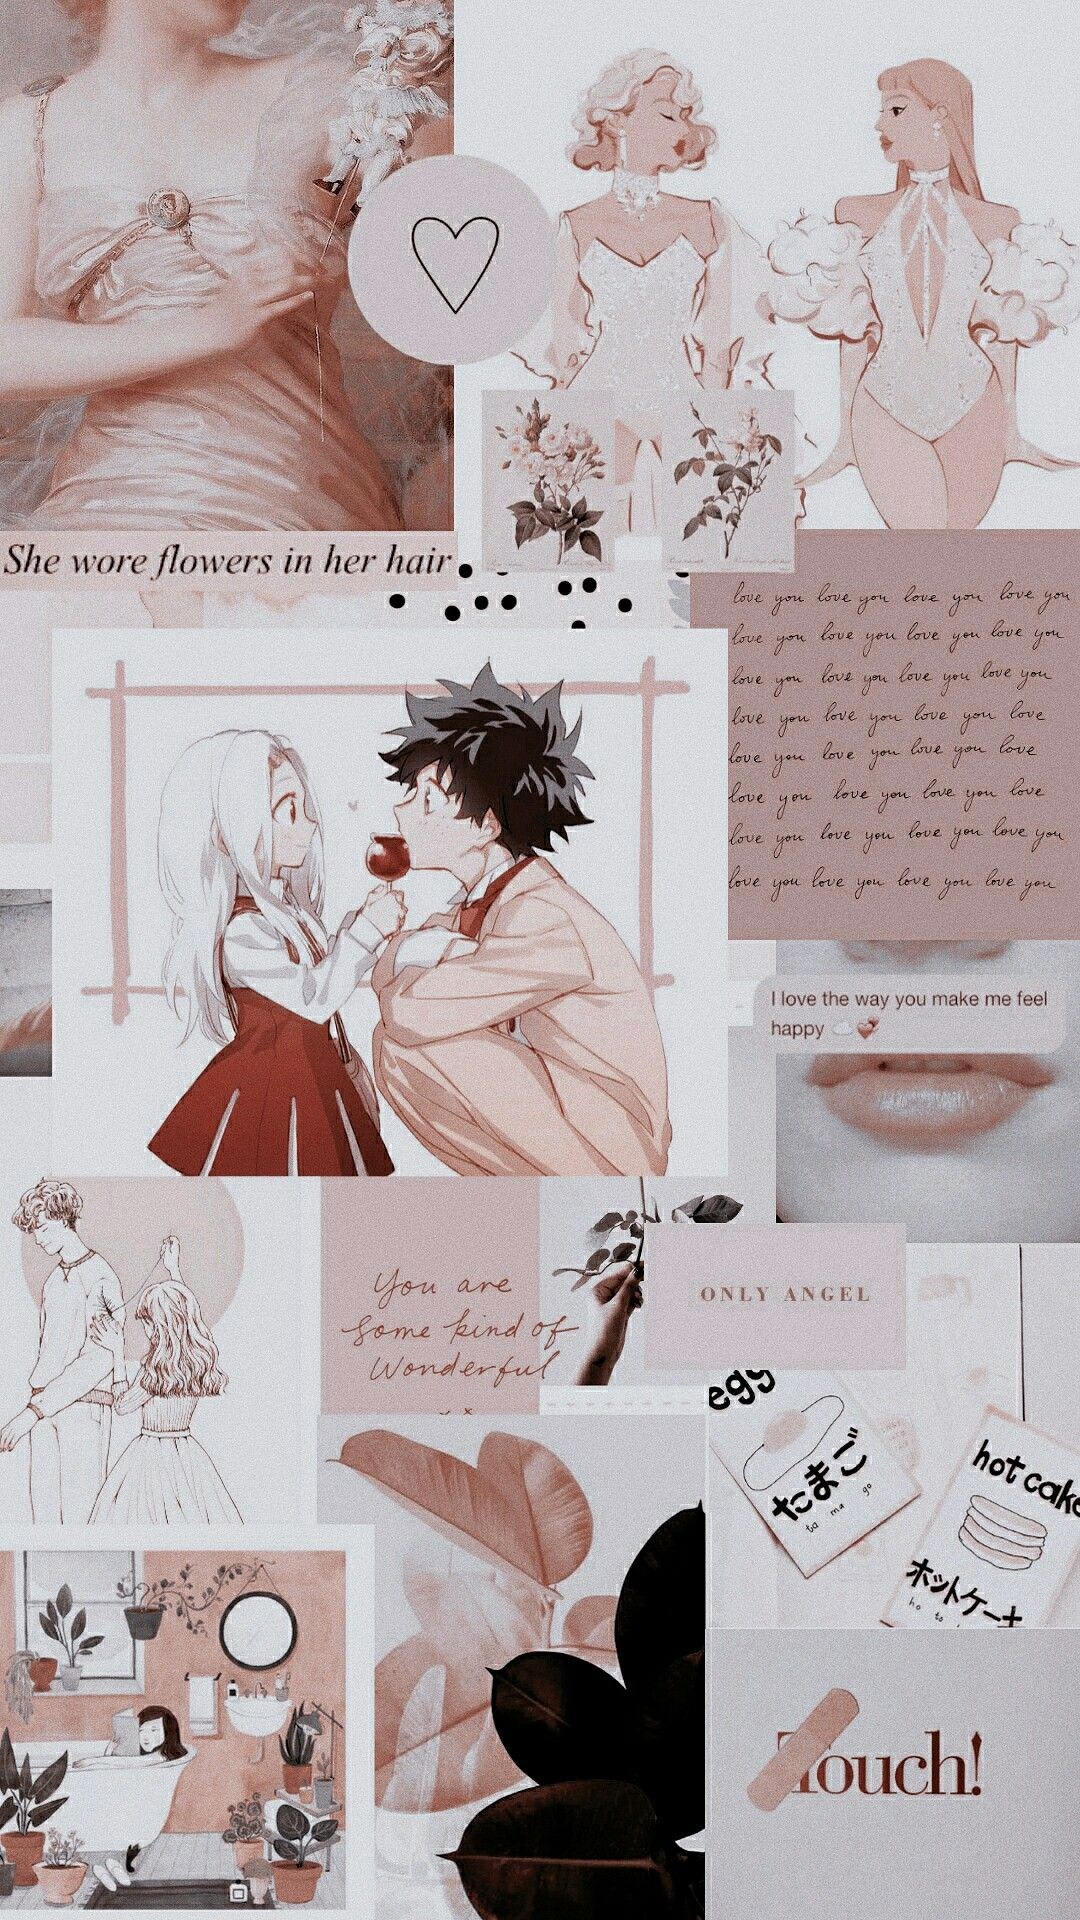 Deku Eri Anime Wallpaper Iphone Cute Anime Wallpaper Anime Wallpaper Cute anime wallpaper collage